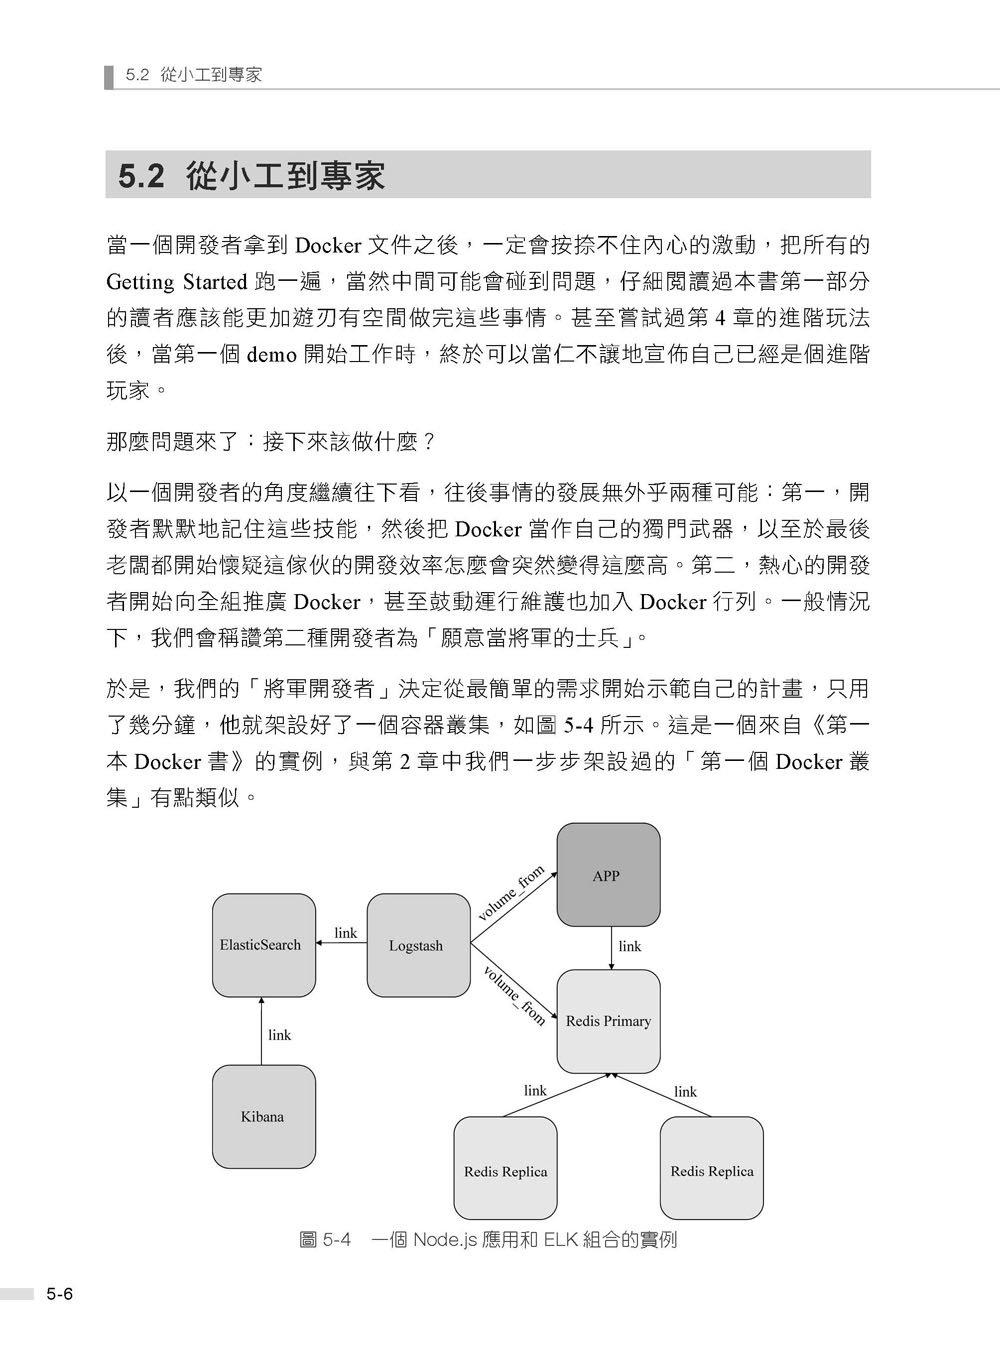 docker 雲端超容器絕佳利器 -- 終極高效輕量級虛擬化工具 (舊名: 比 VM 粒度更細的 Container 時代來臨 : 使用 Docker 不再需要架設系統, 2/e)-preview-12